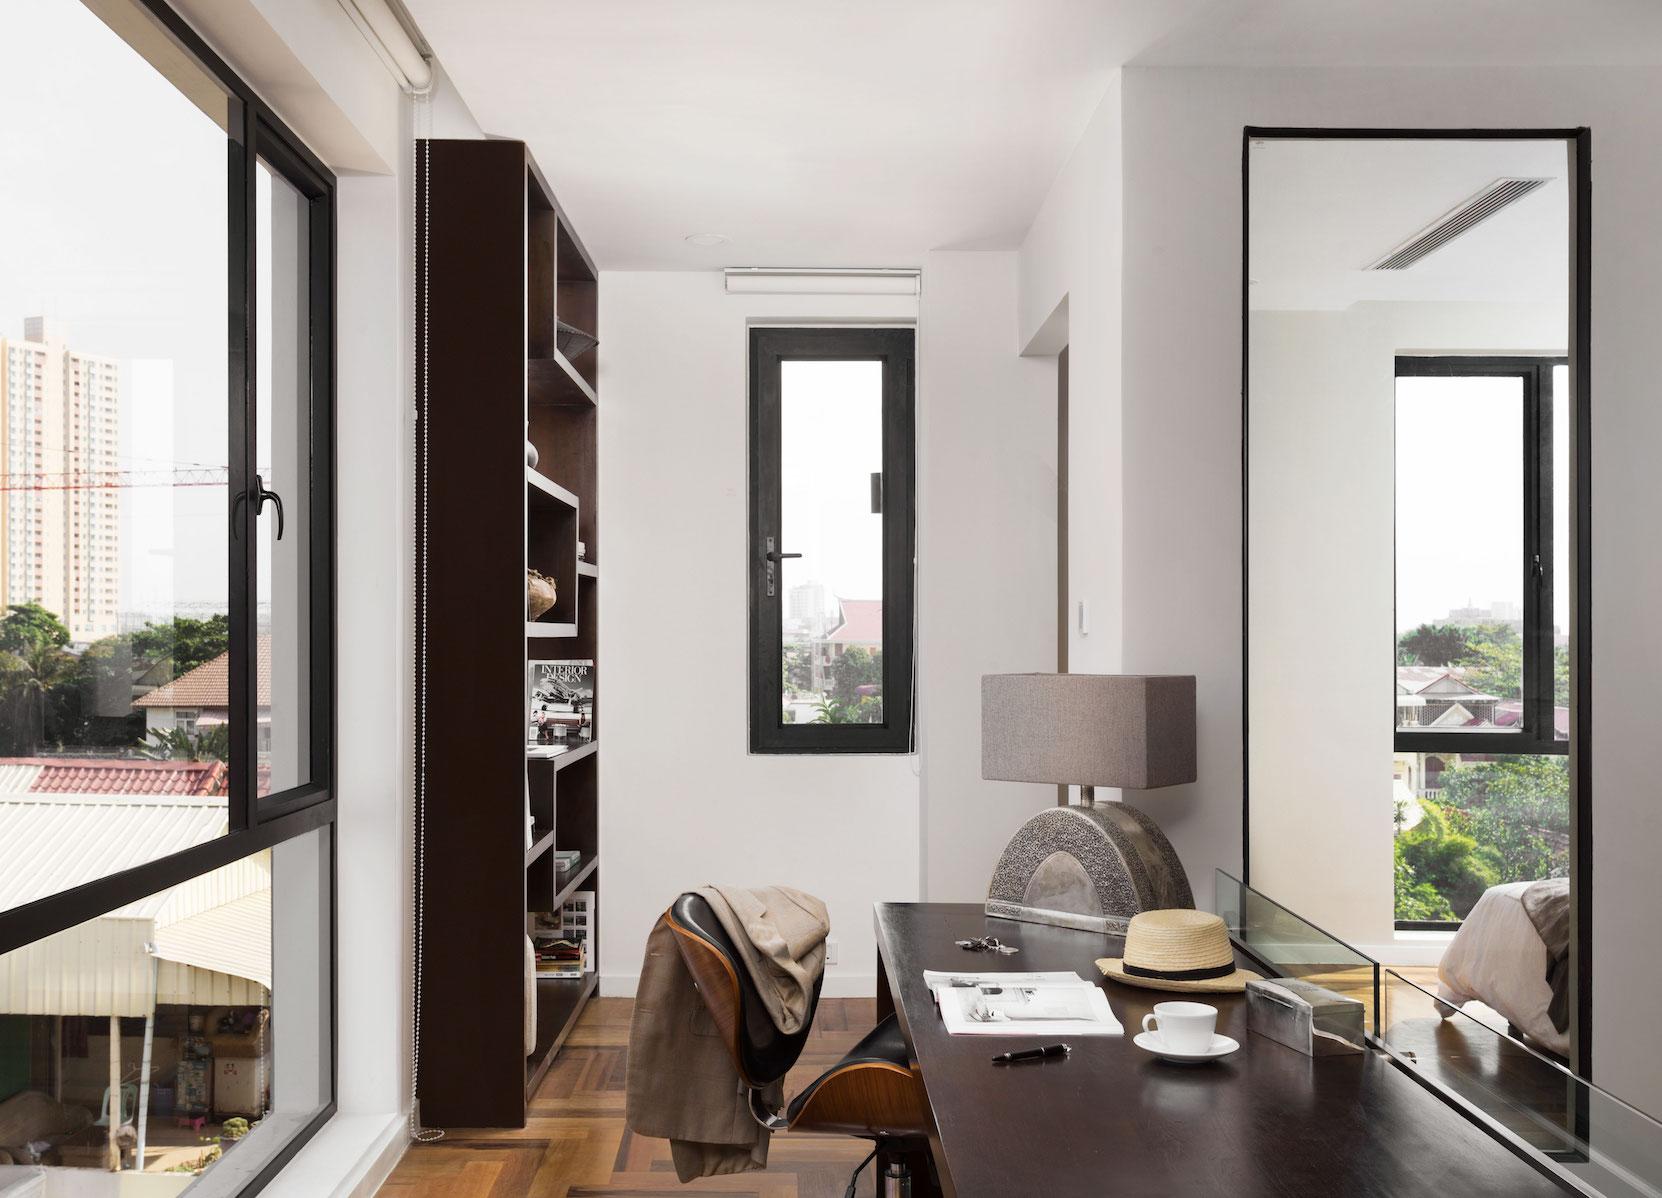 3-bed-duplex-studyhabitat-condos-property-phnom-penh.jpg